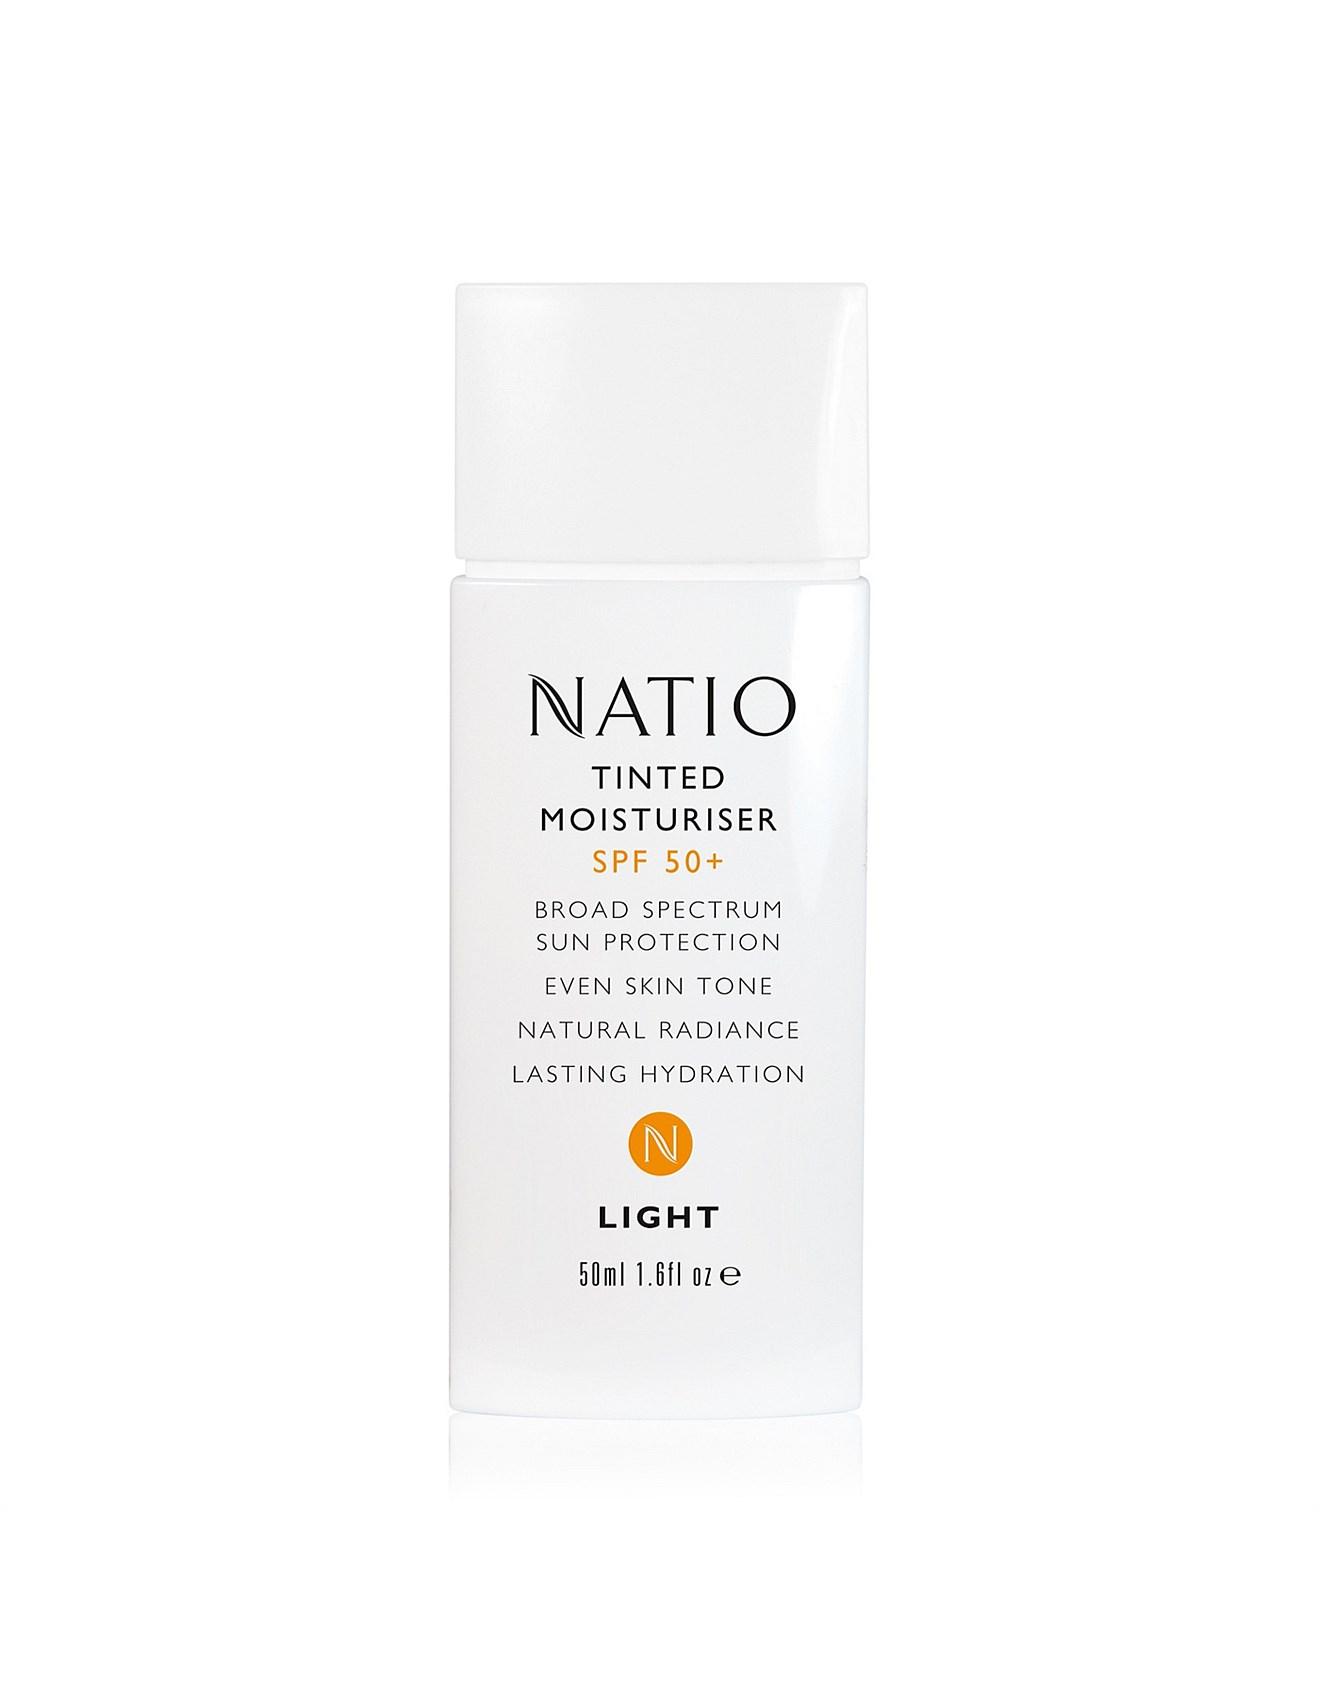 natio tinted moisturiser spf 50 review